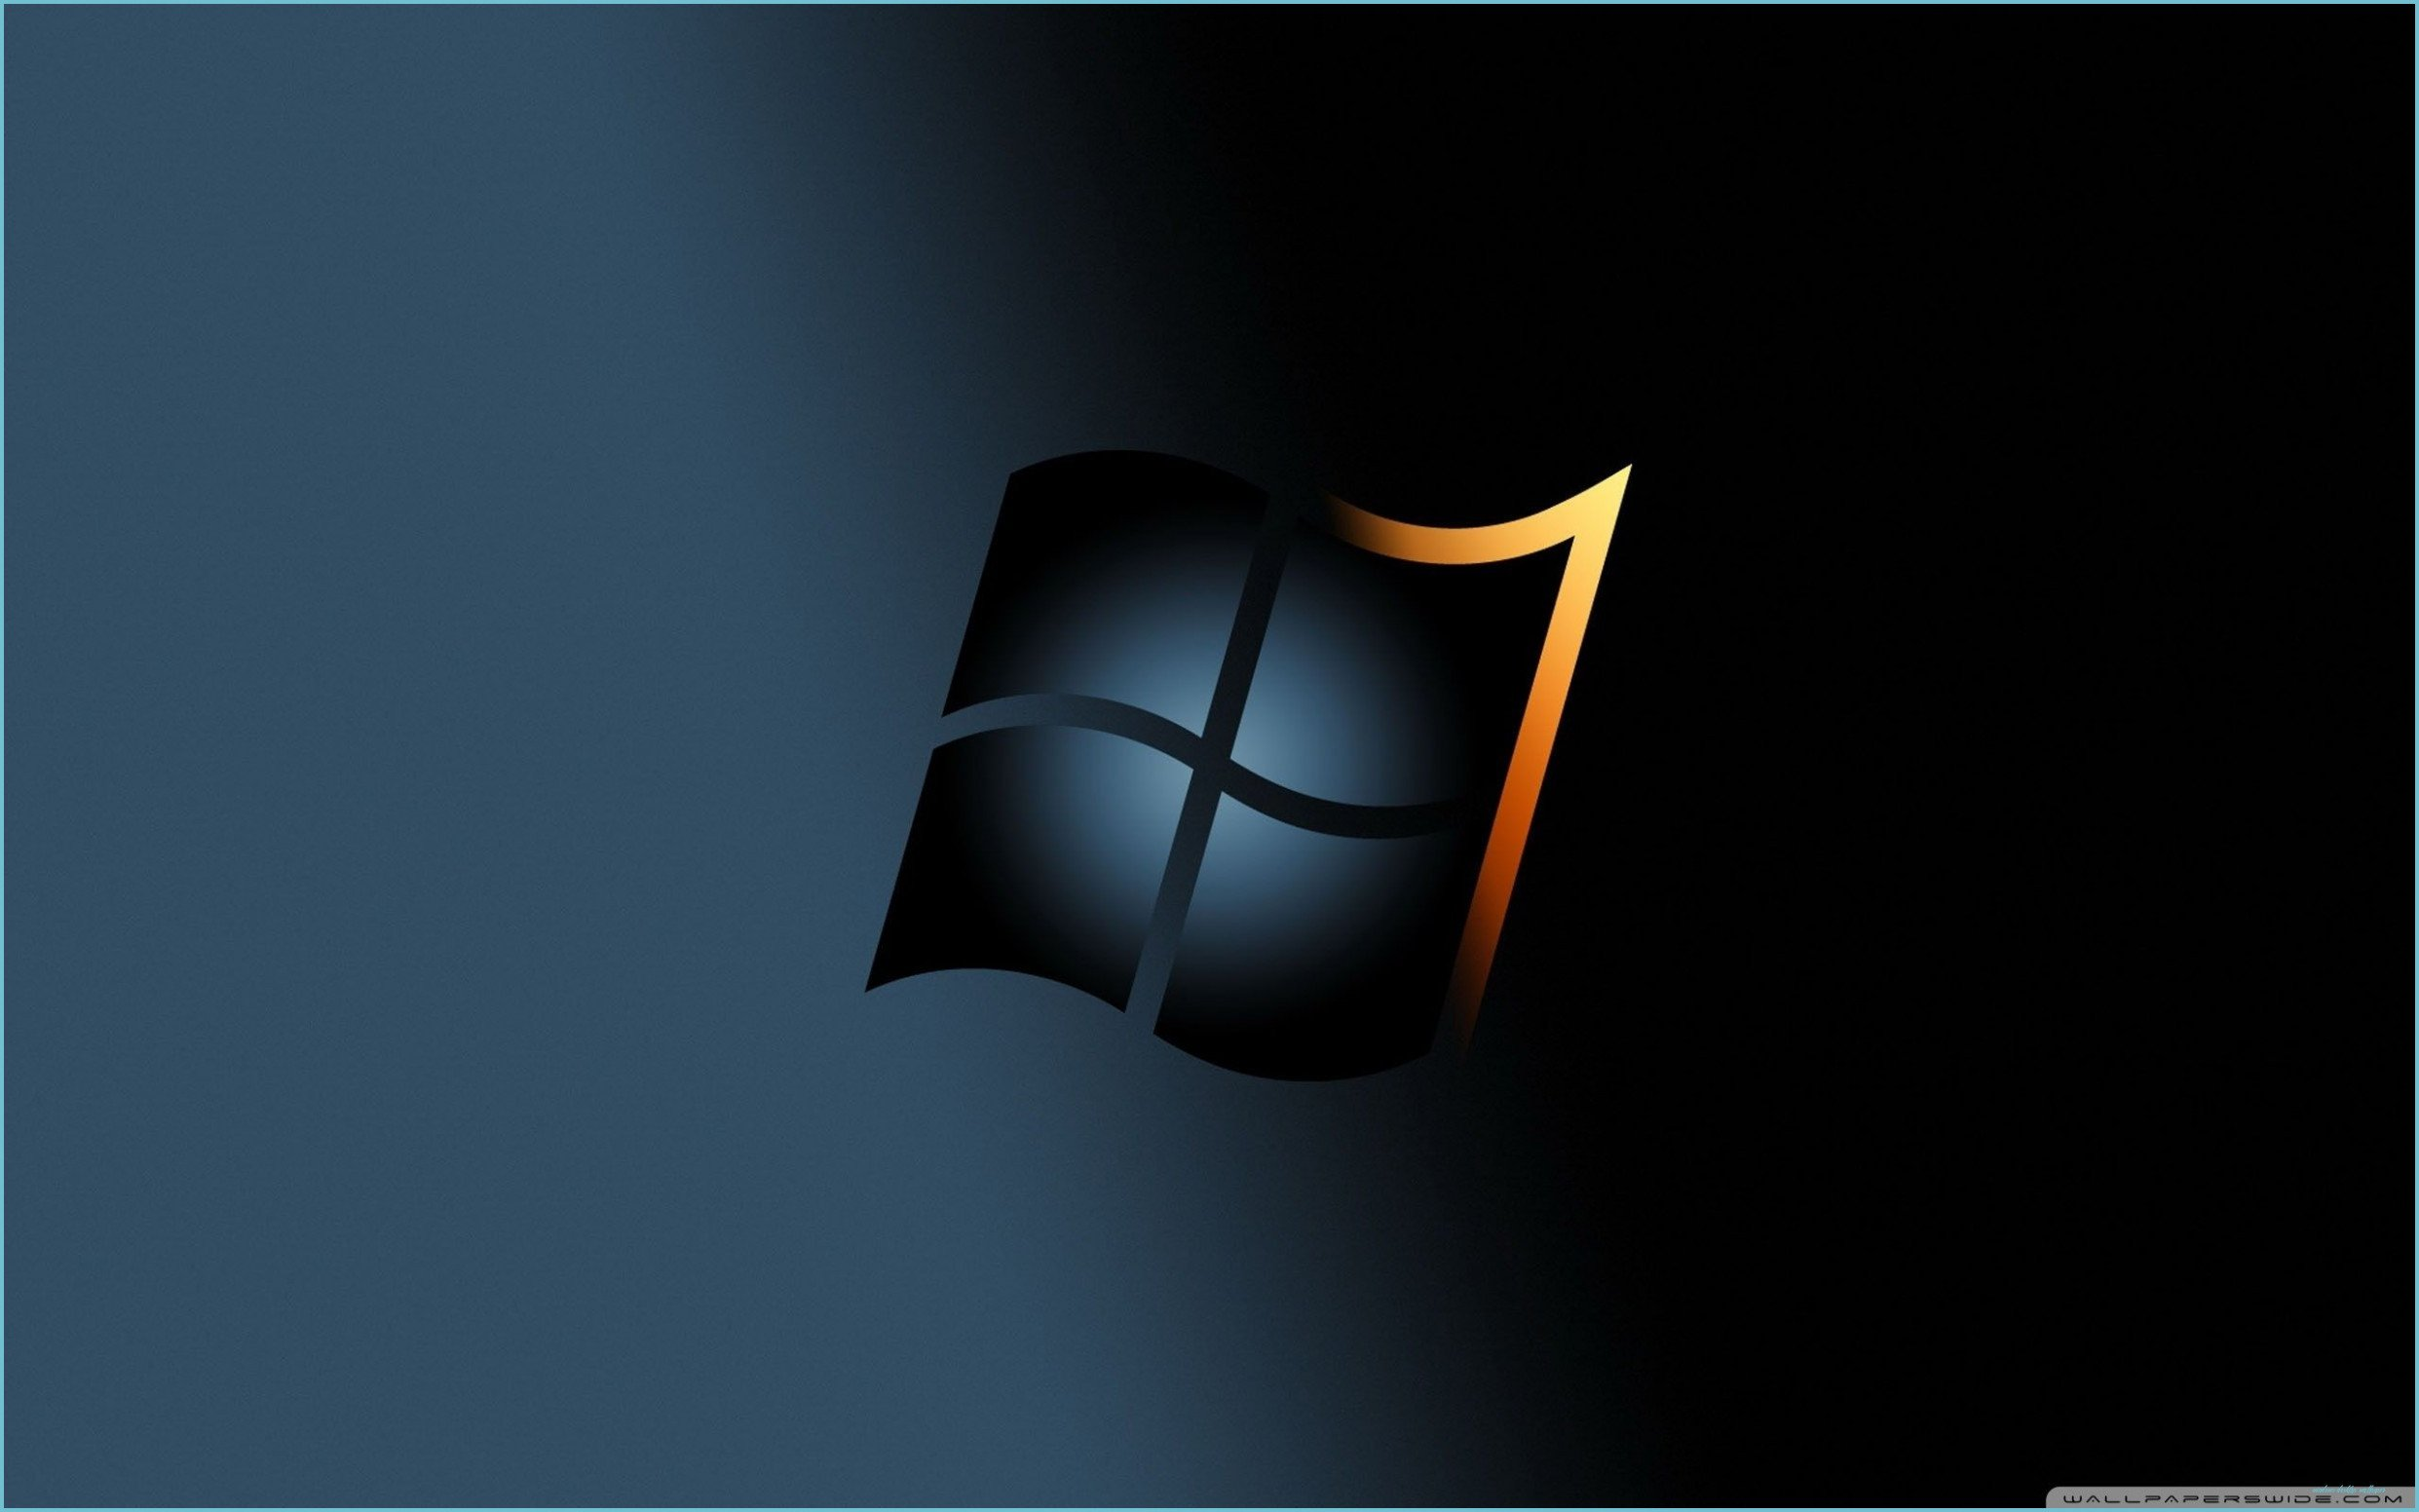 Windows 11 Dark HD Desktop Wallpaper High Definition 2483x1552